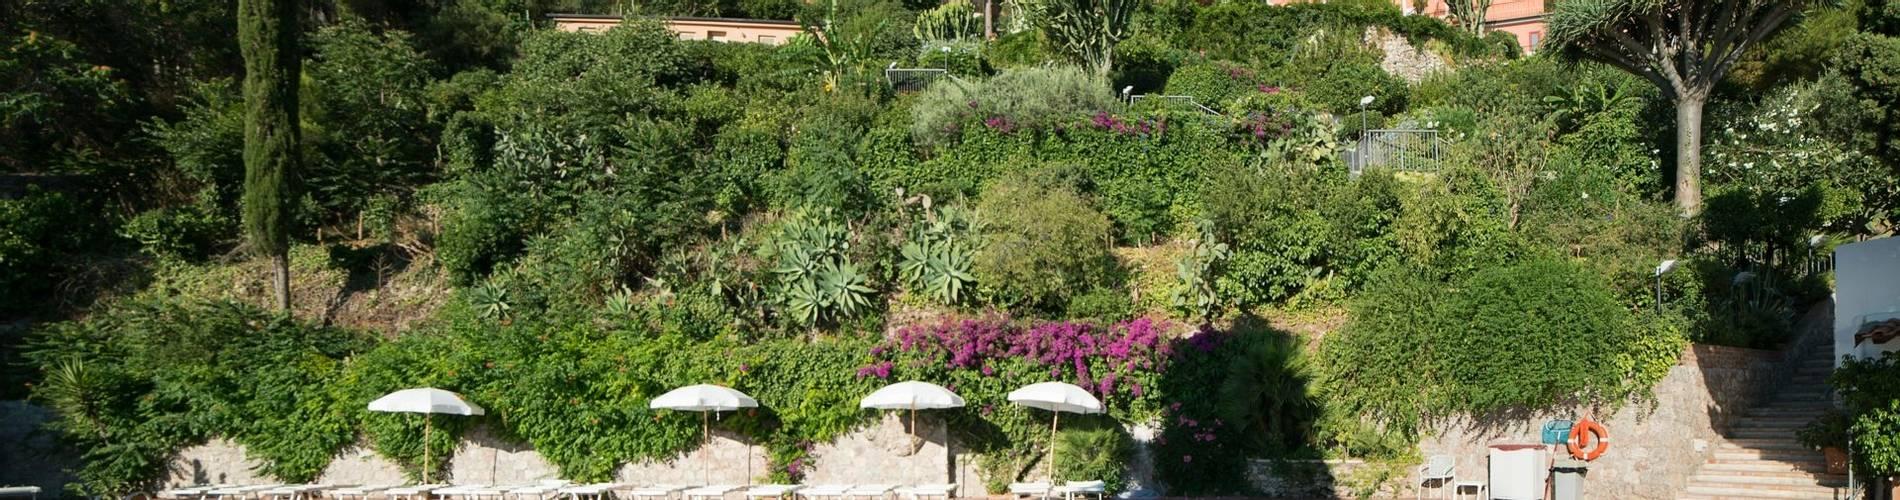 Grand Hotel Miramare, Sicily, Italy (9).jpg